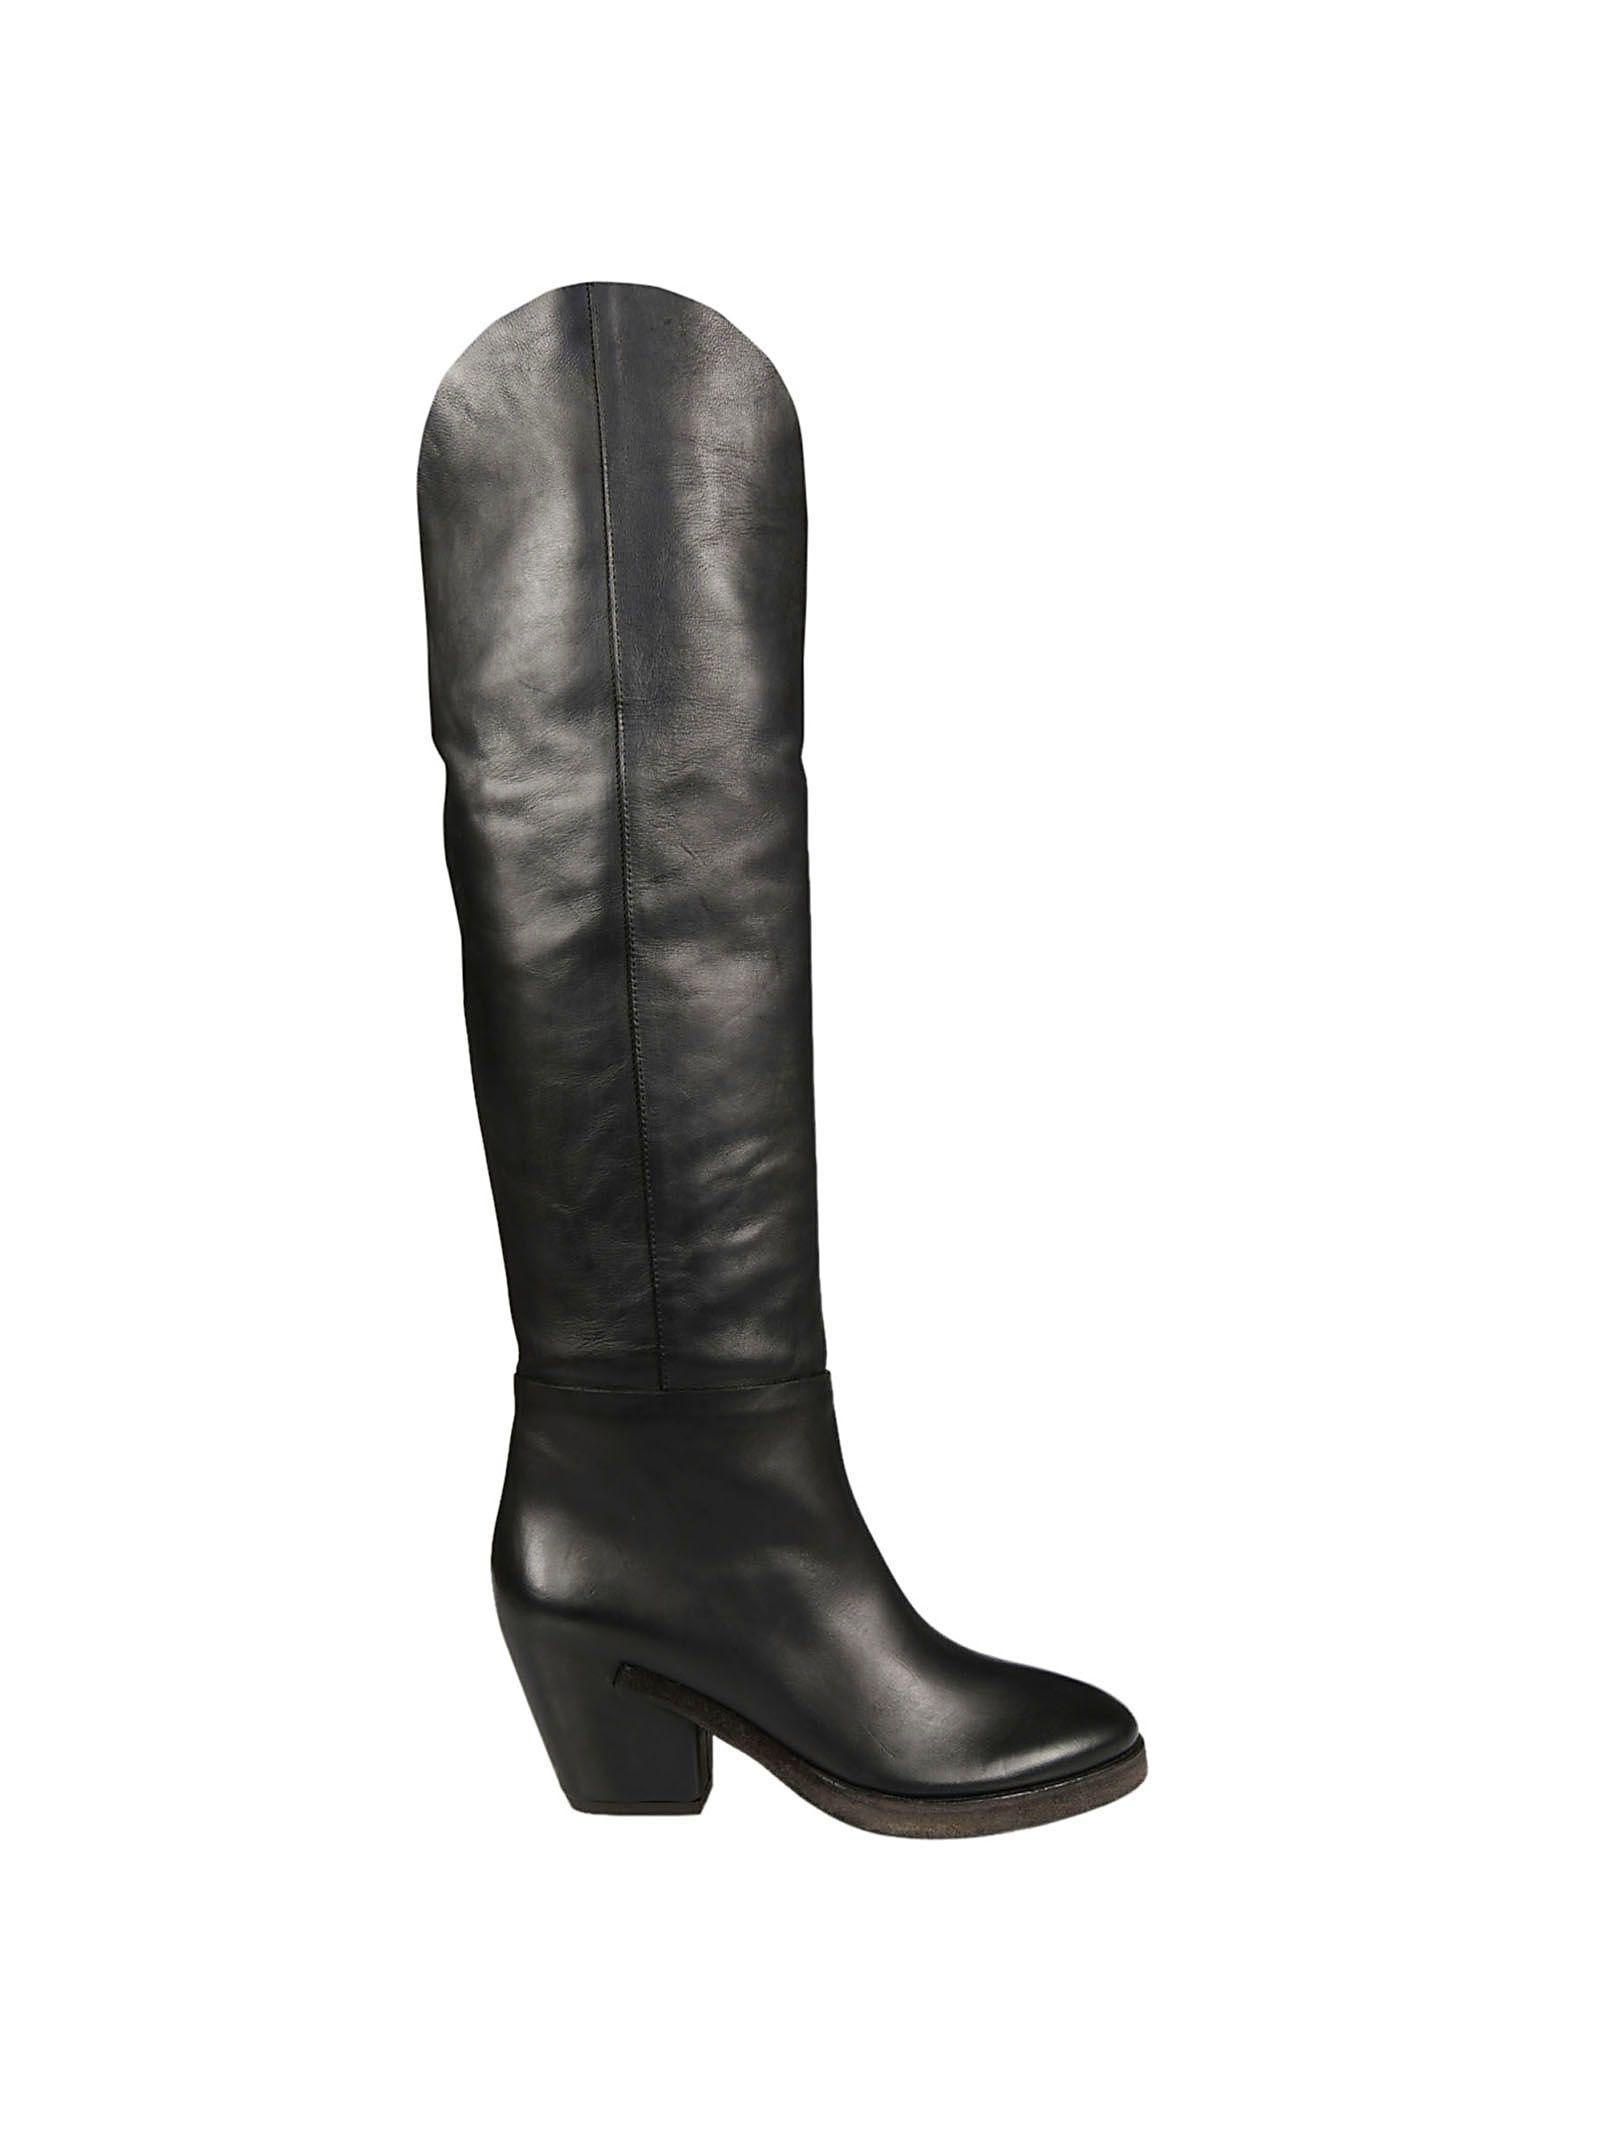 Roberto Del Carlo 10417 Boots In Black